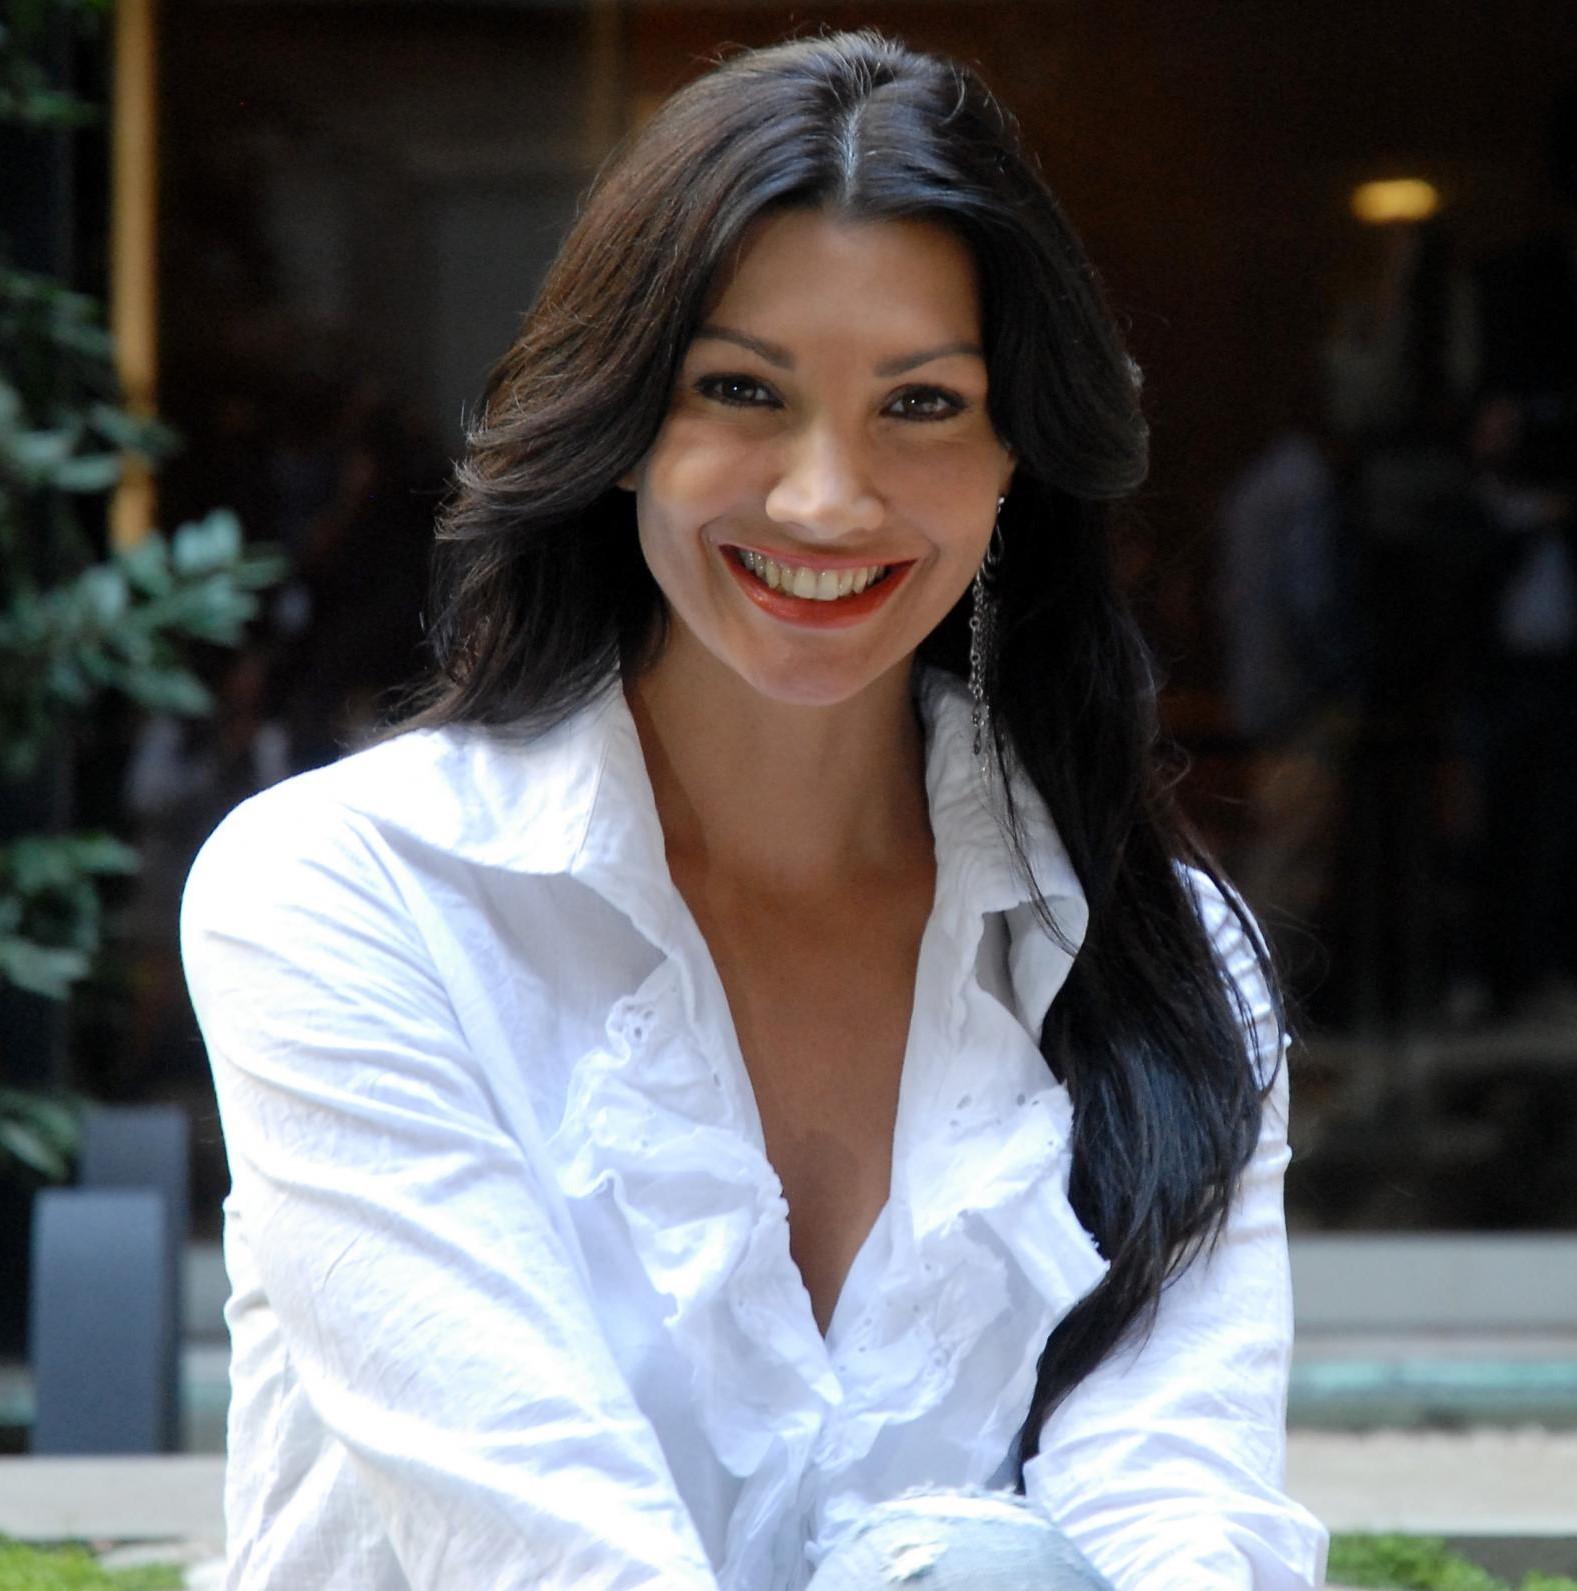 Luisa Corna Matrimonio Carabiniere Stefano Giovino